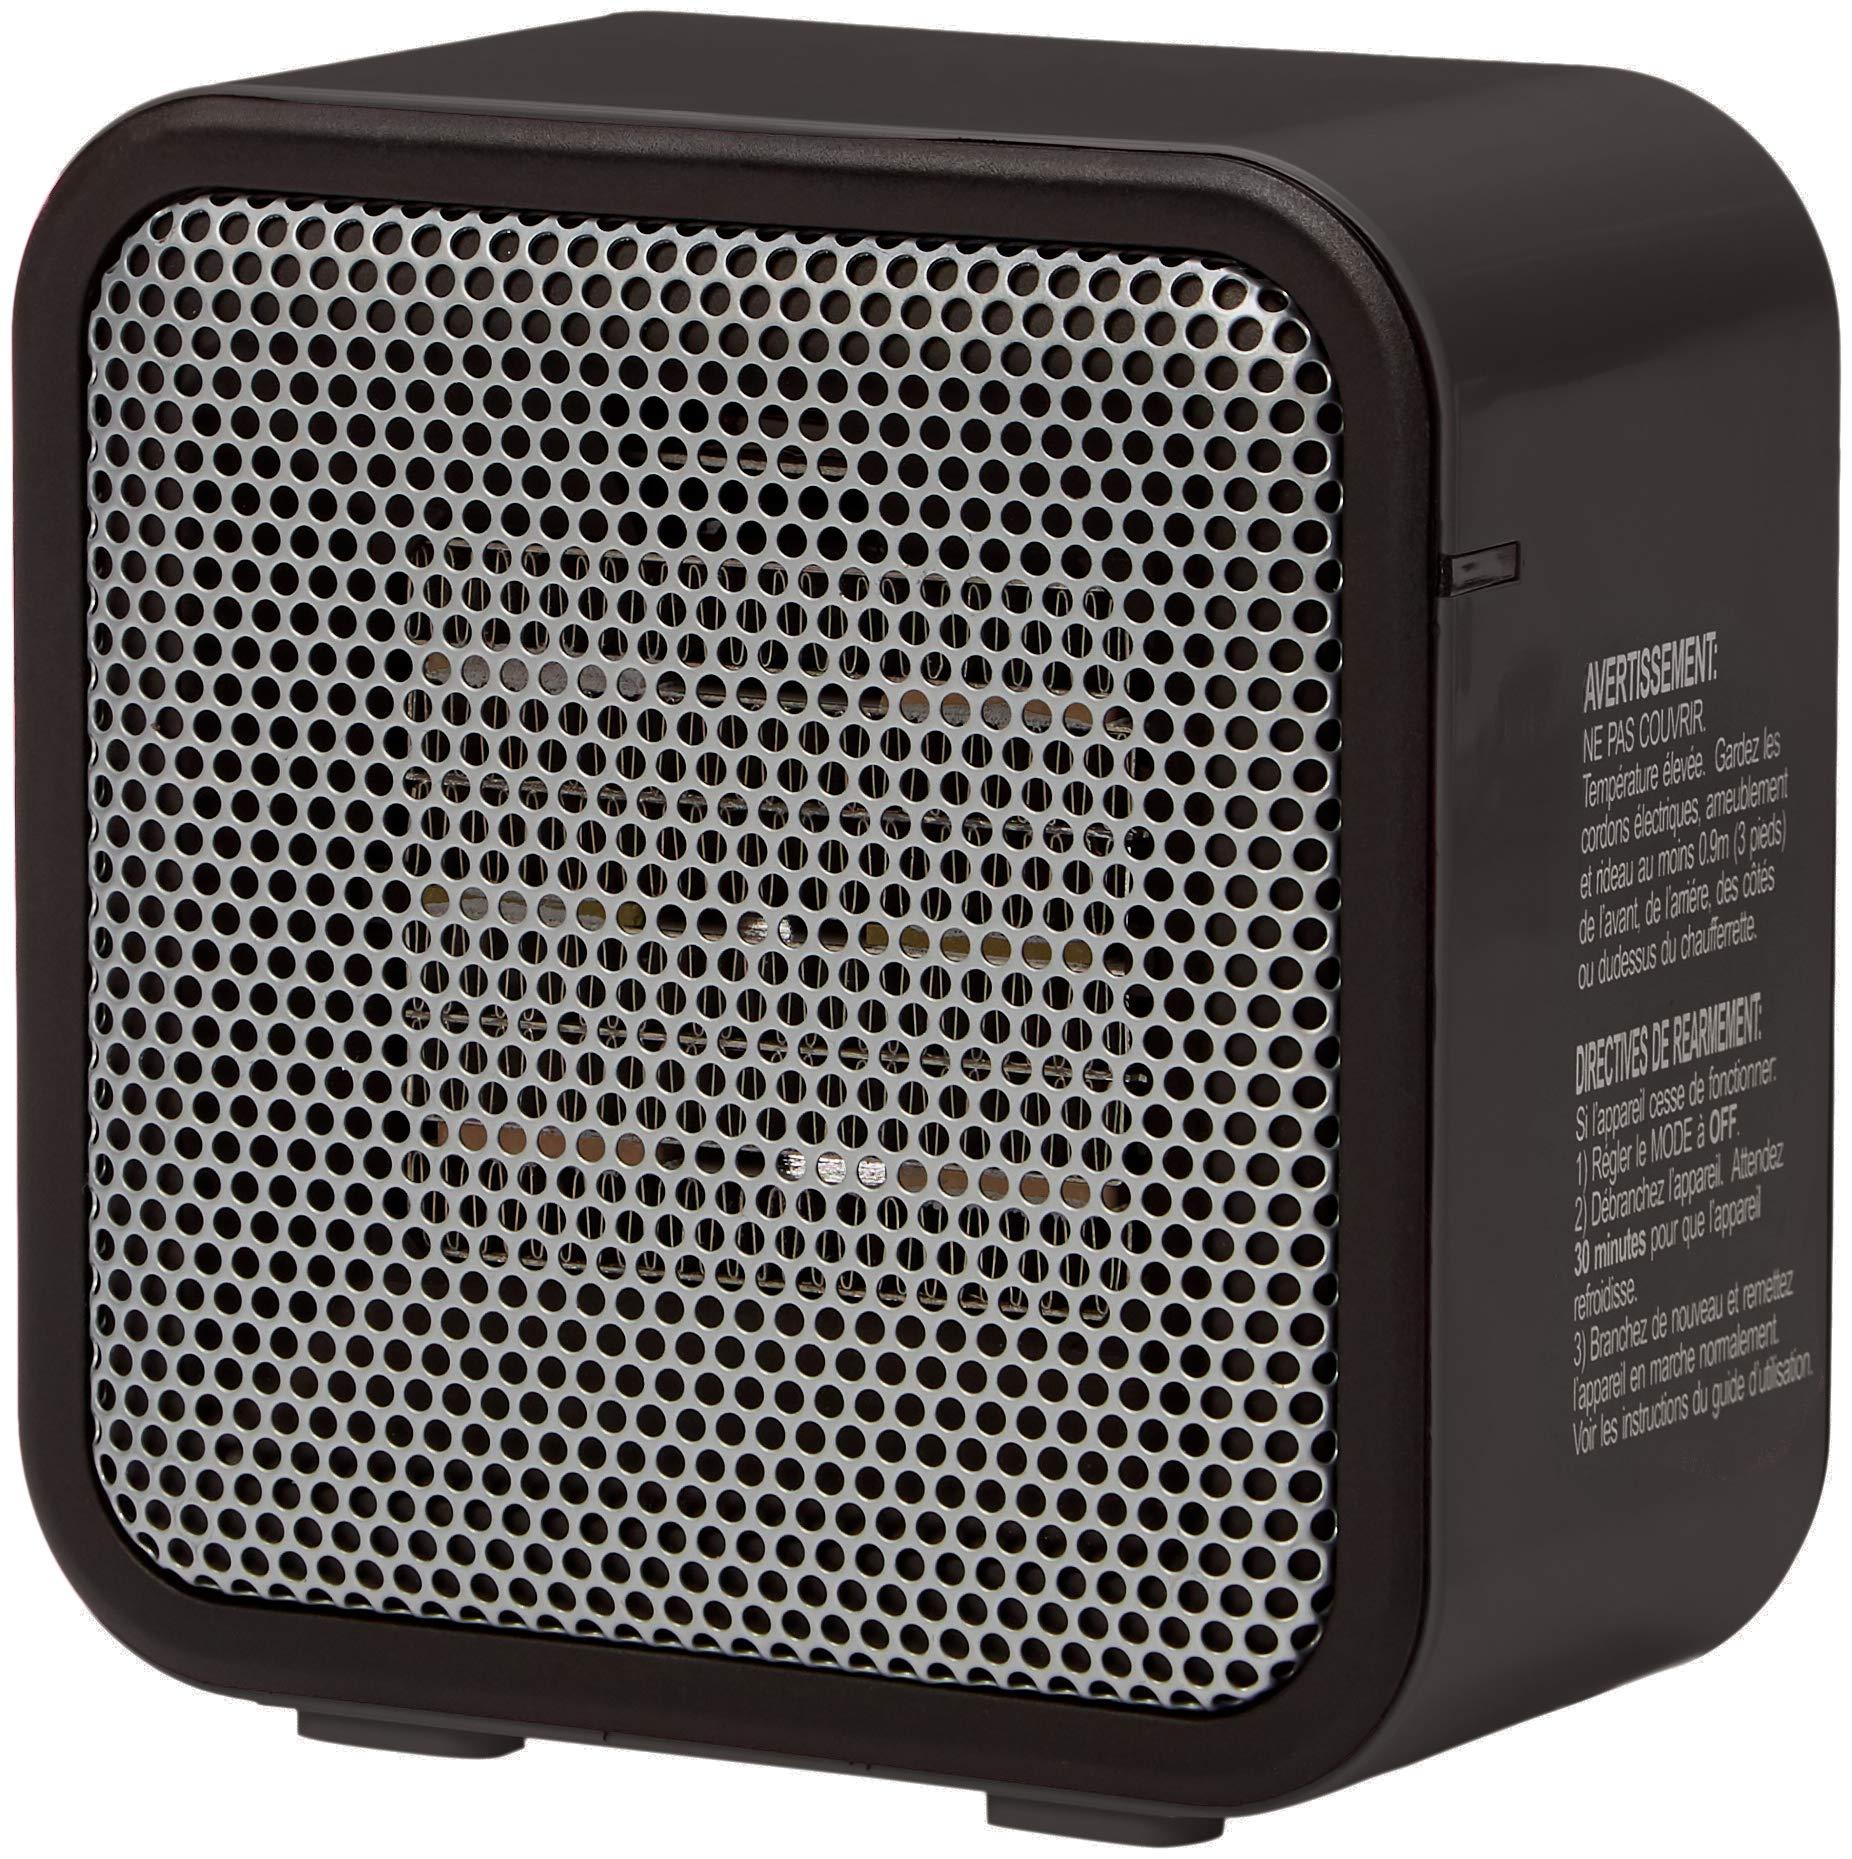 Amazon Basics 500-Watt Ceramic Small Space Personal Mini Heater - Black